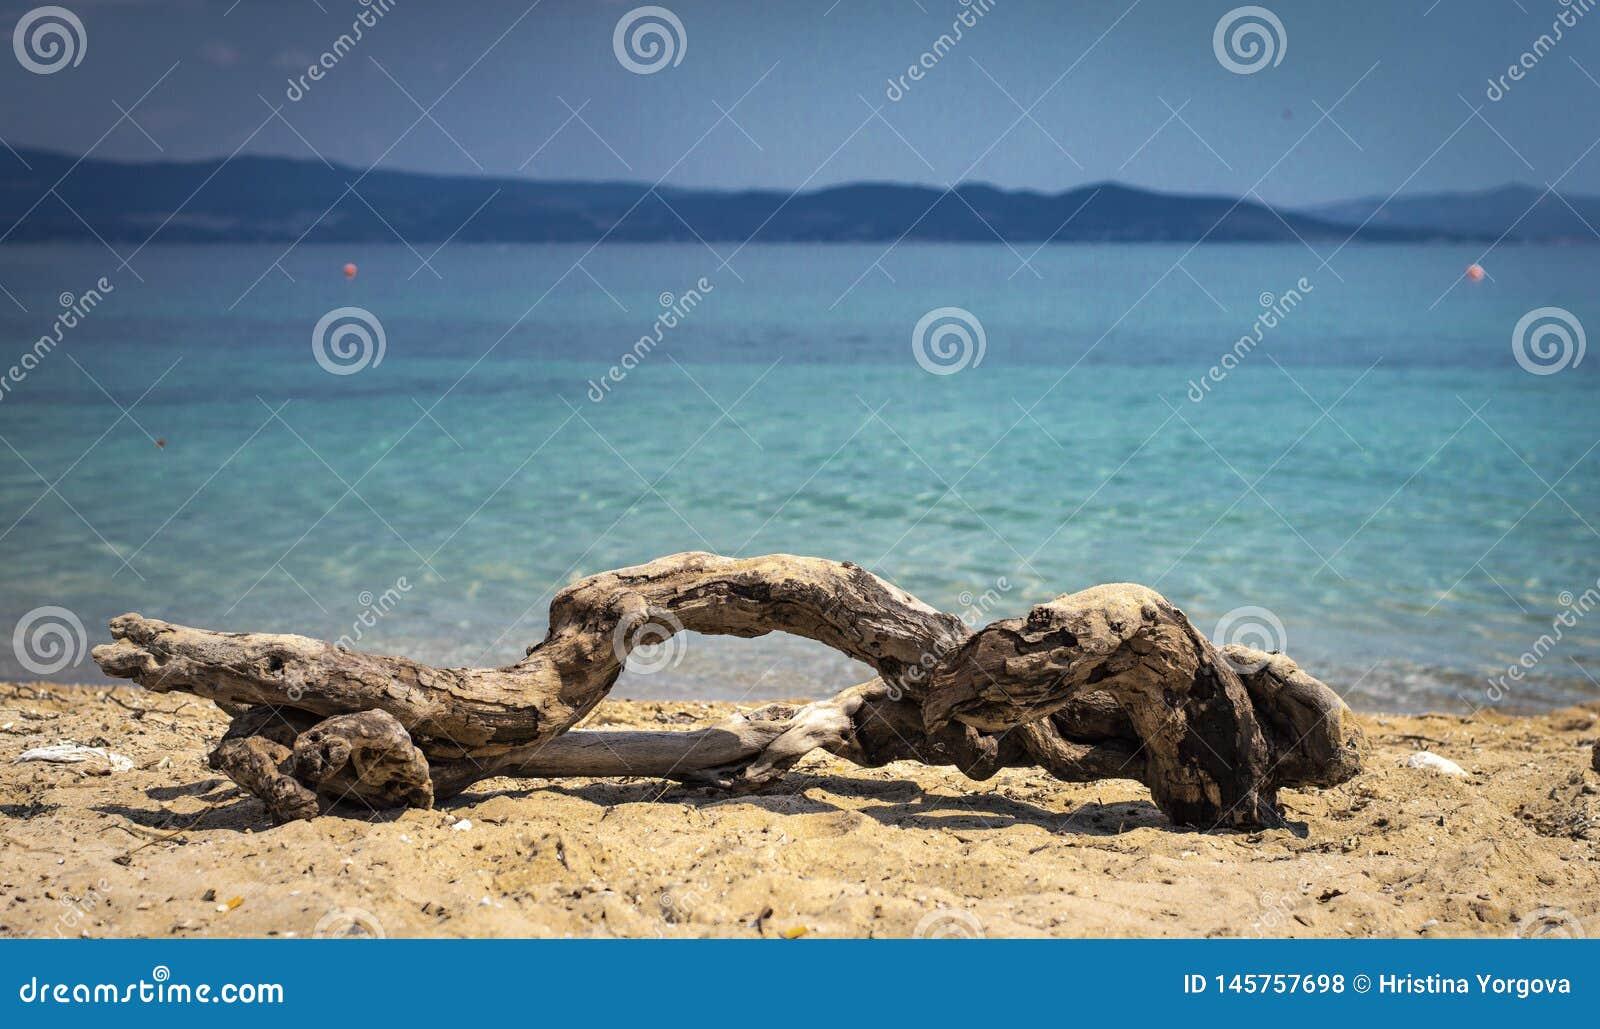 Sea and Sand landscape